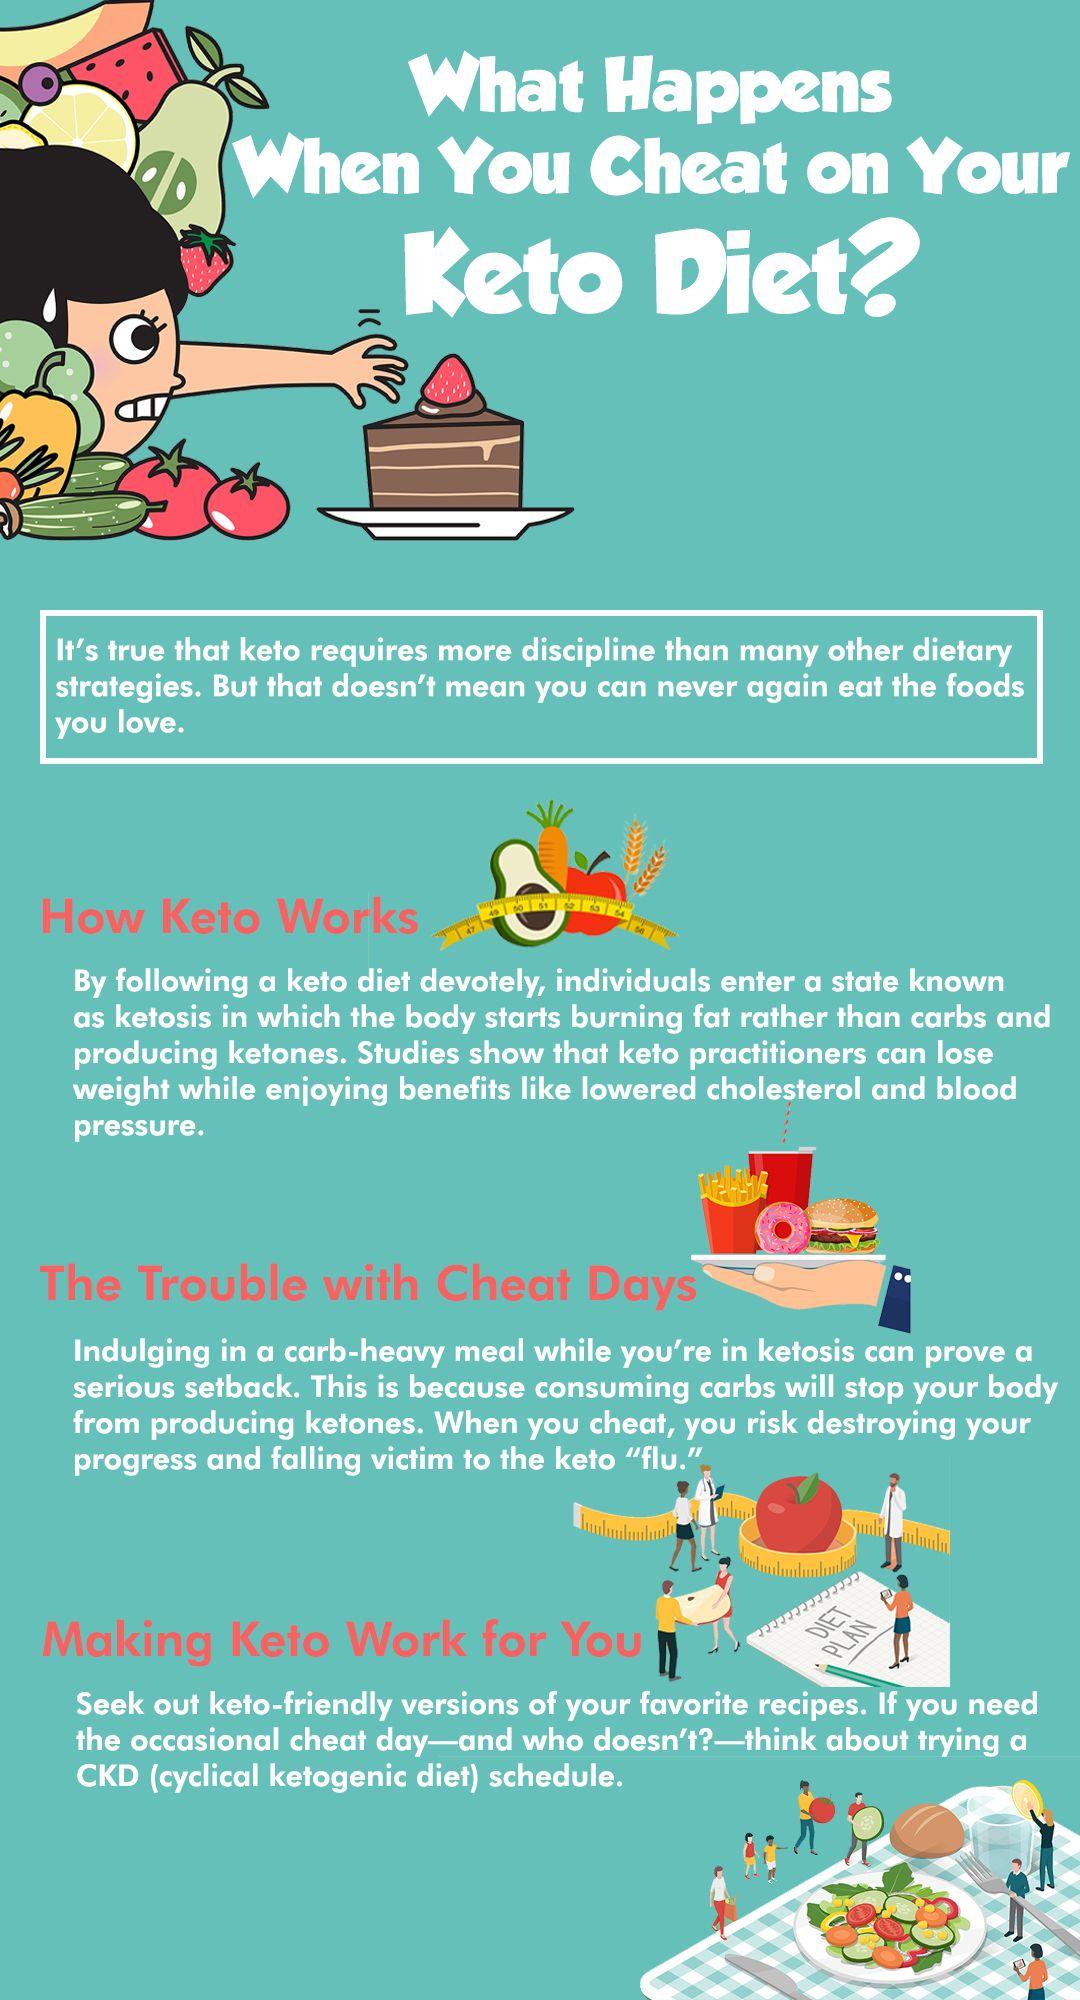 keto diet cheat day lose weight